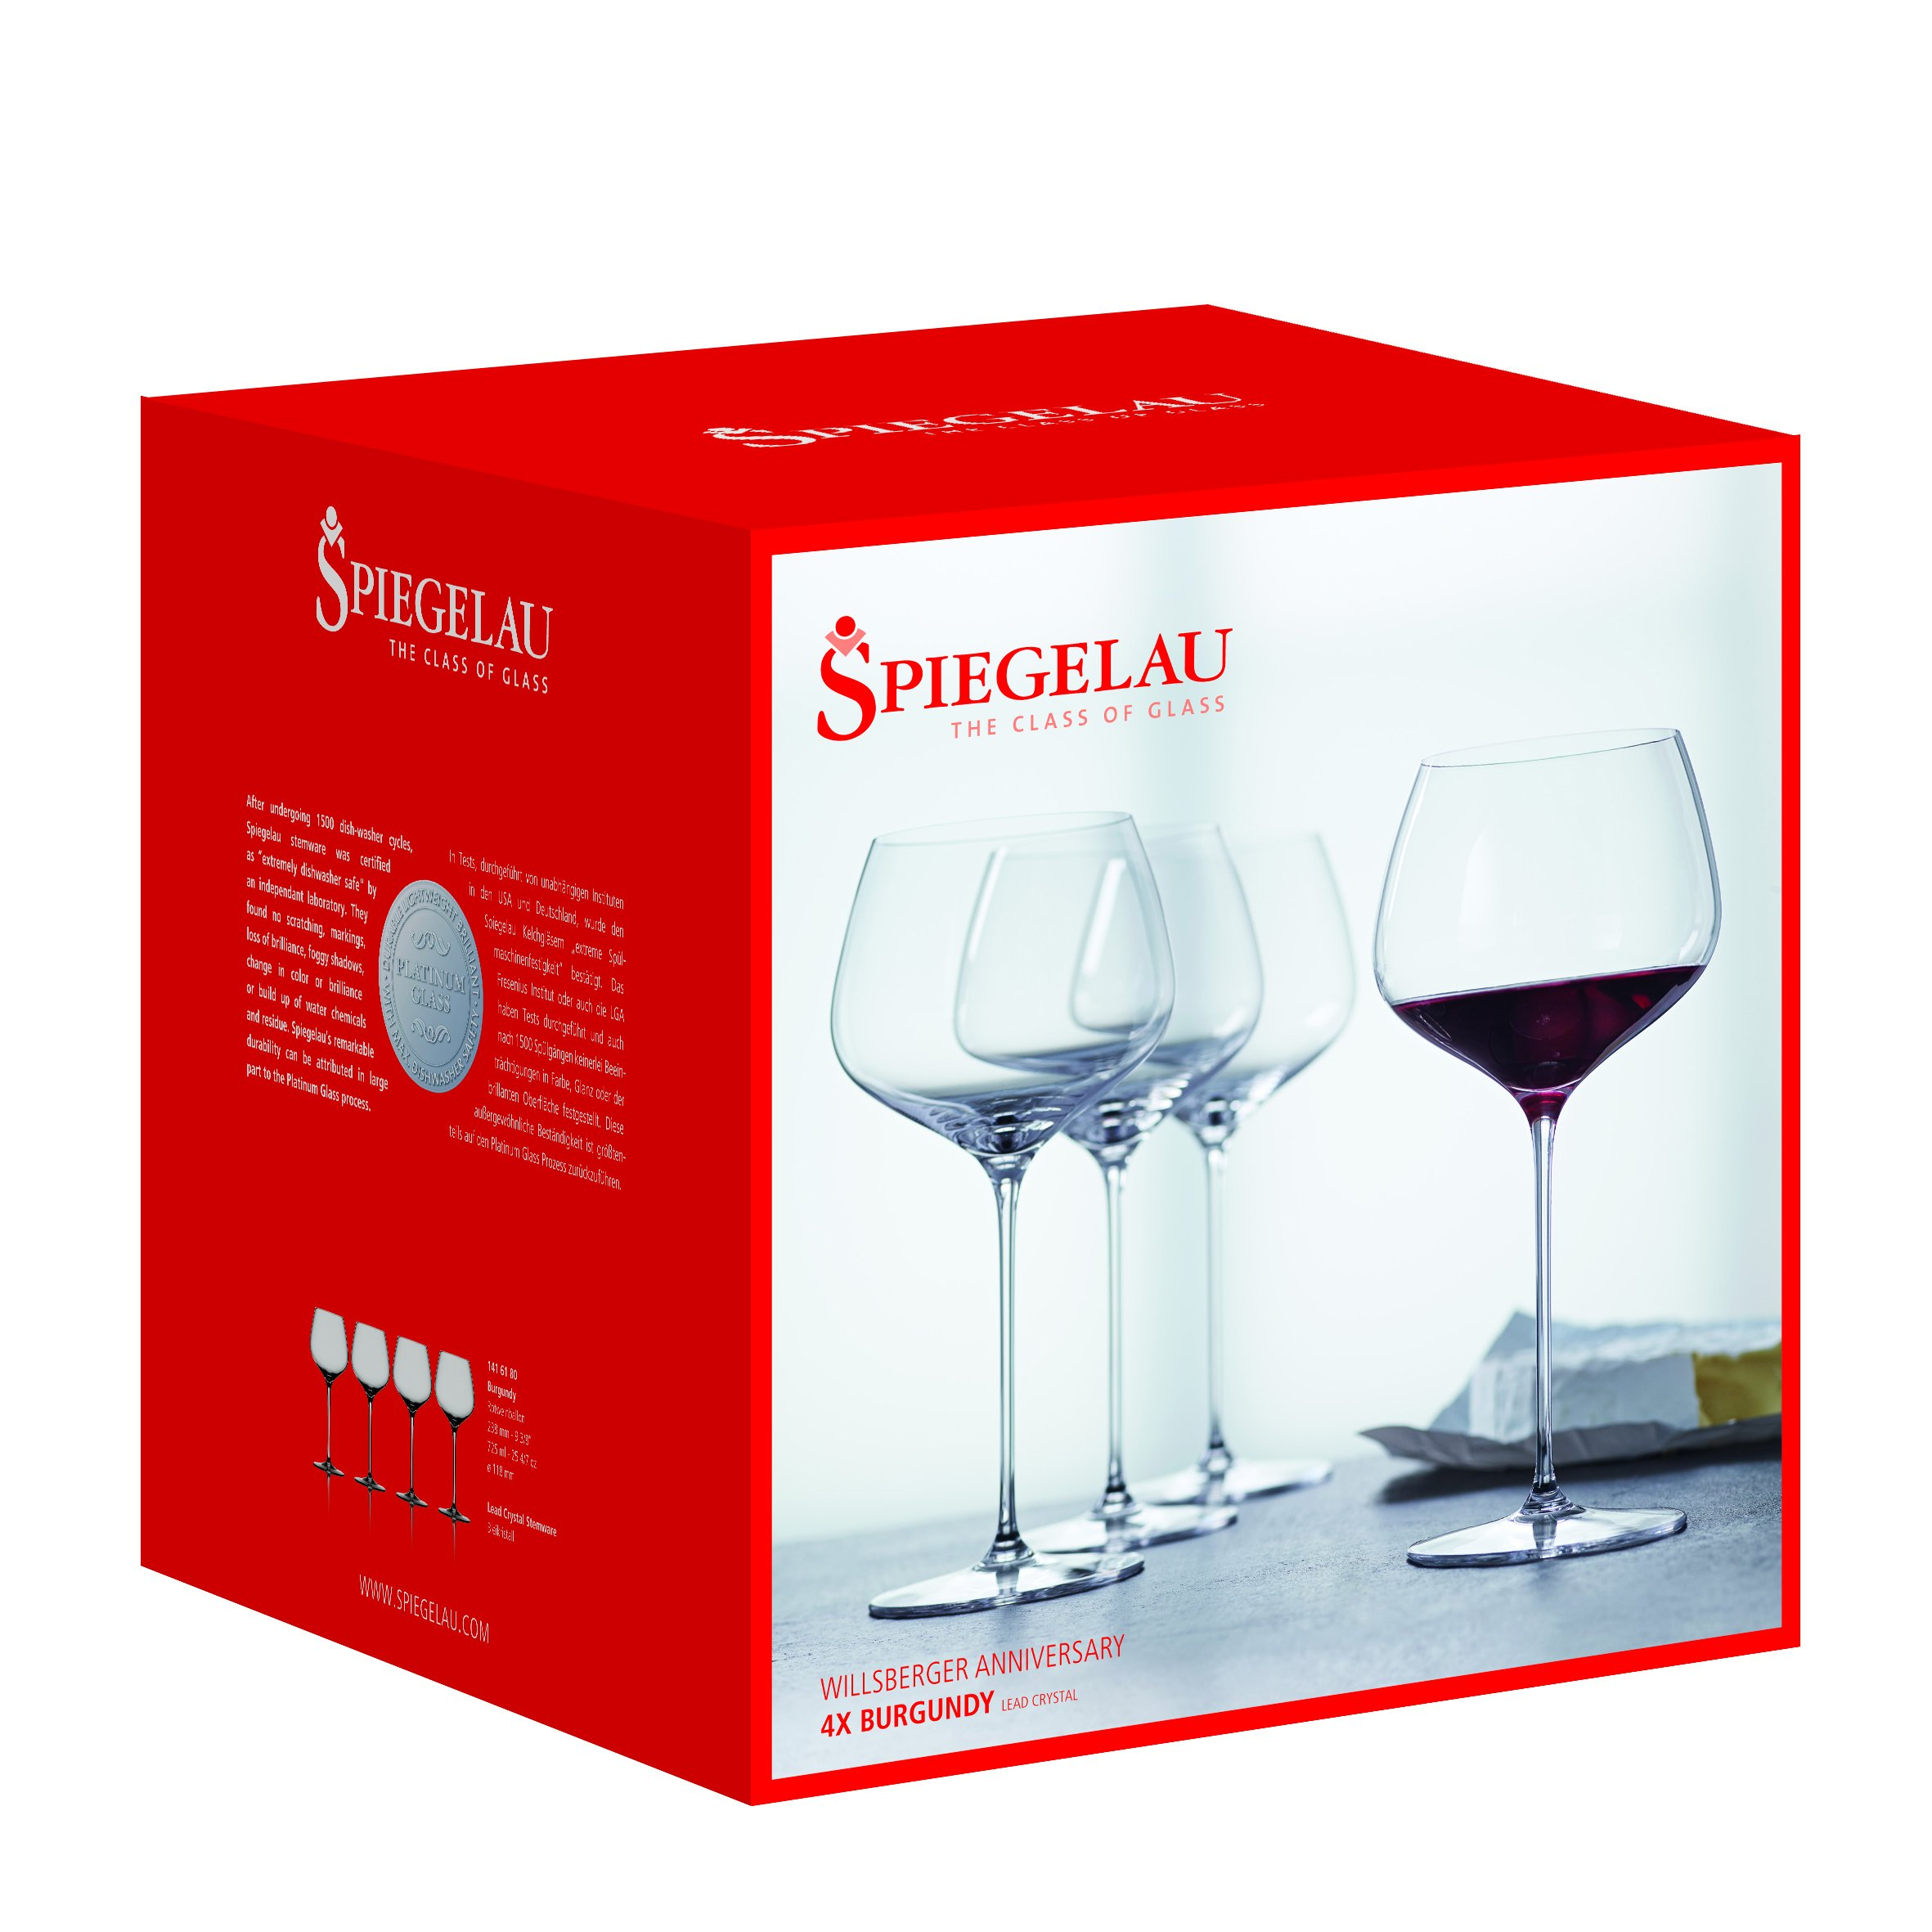 Spiegelau Willsberger Burgundy Glass (Set of 4), 25.6 oz, Clear